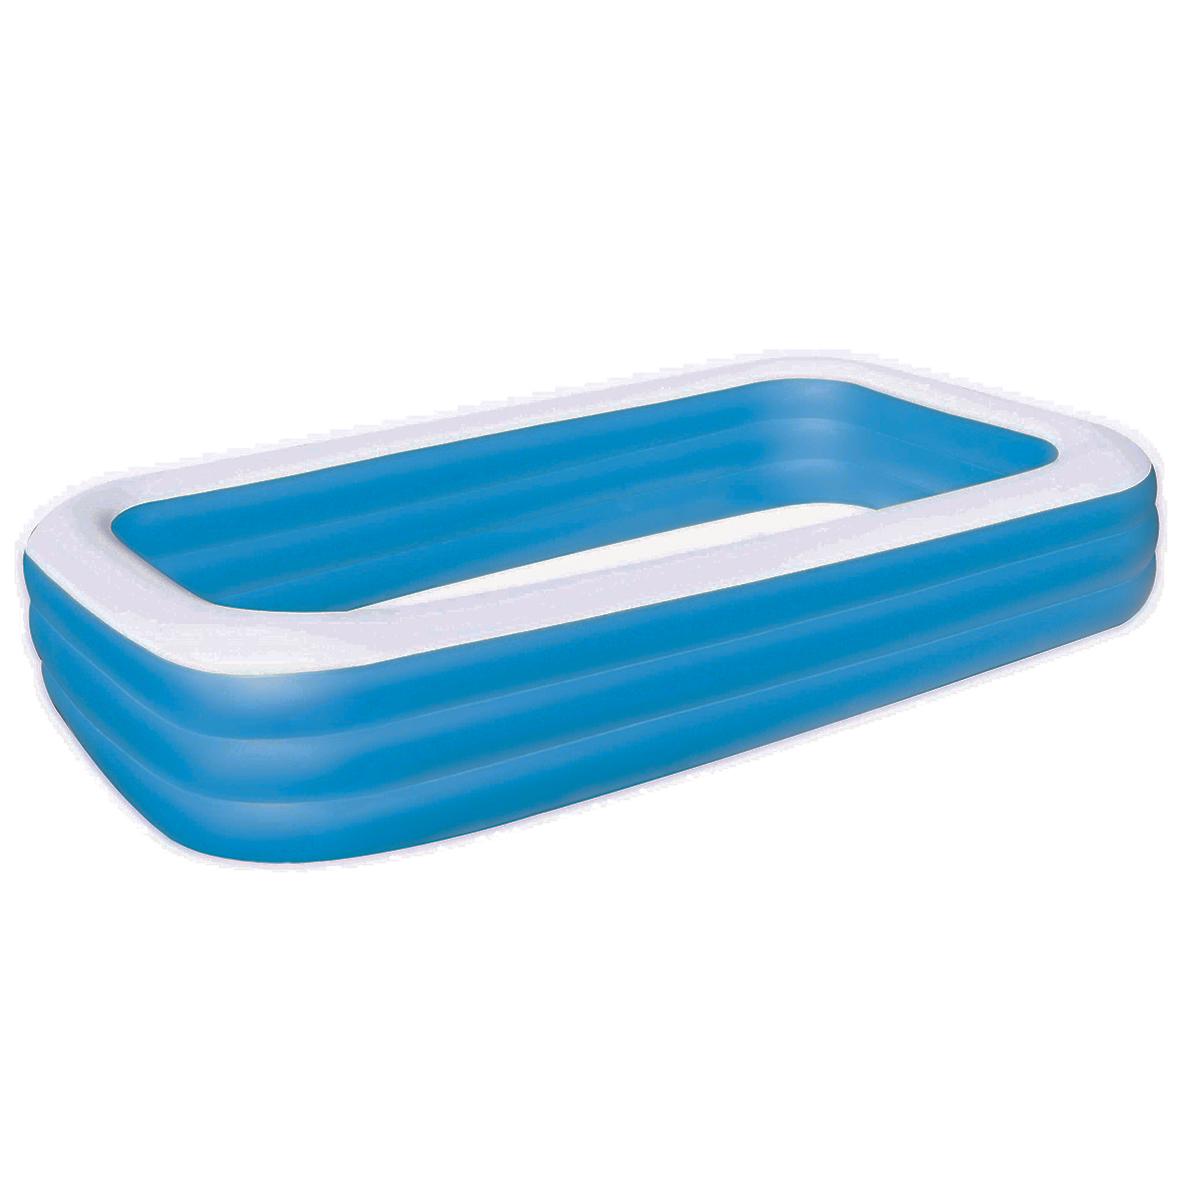 bestway-305-x-183-x-56cm-deluxe-blue-rectangular-family-pool--code-54009